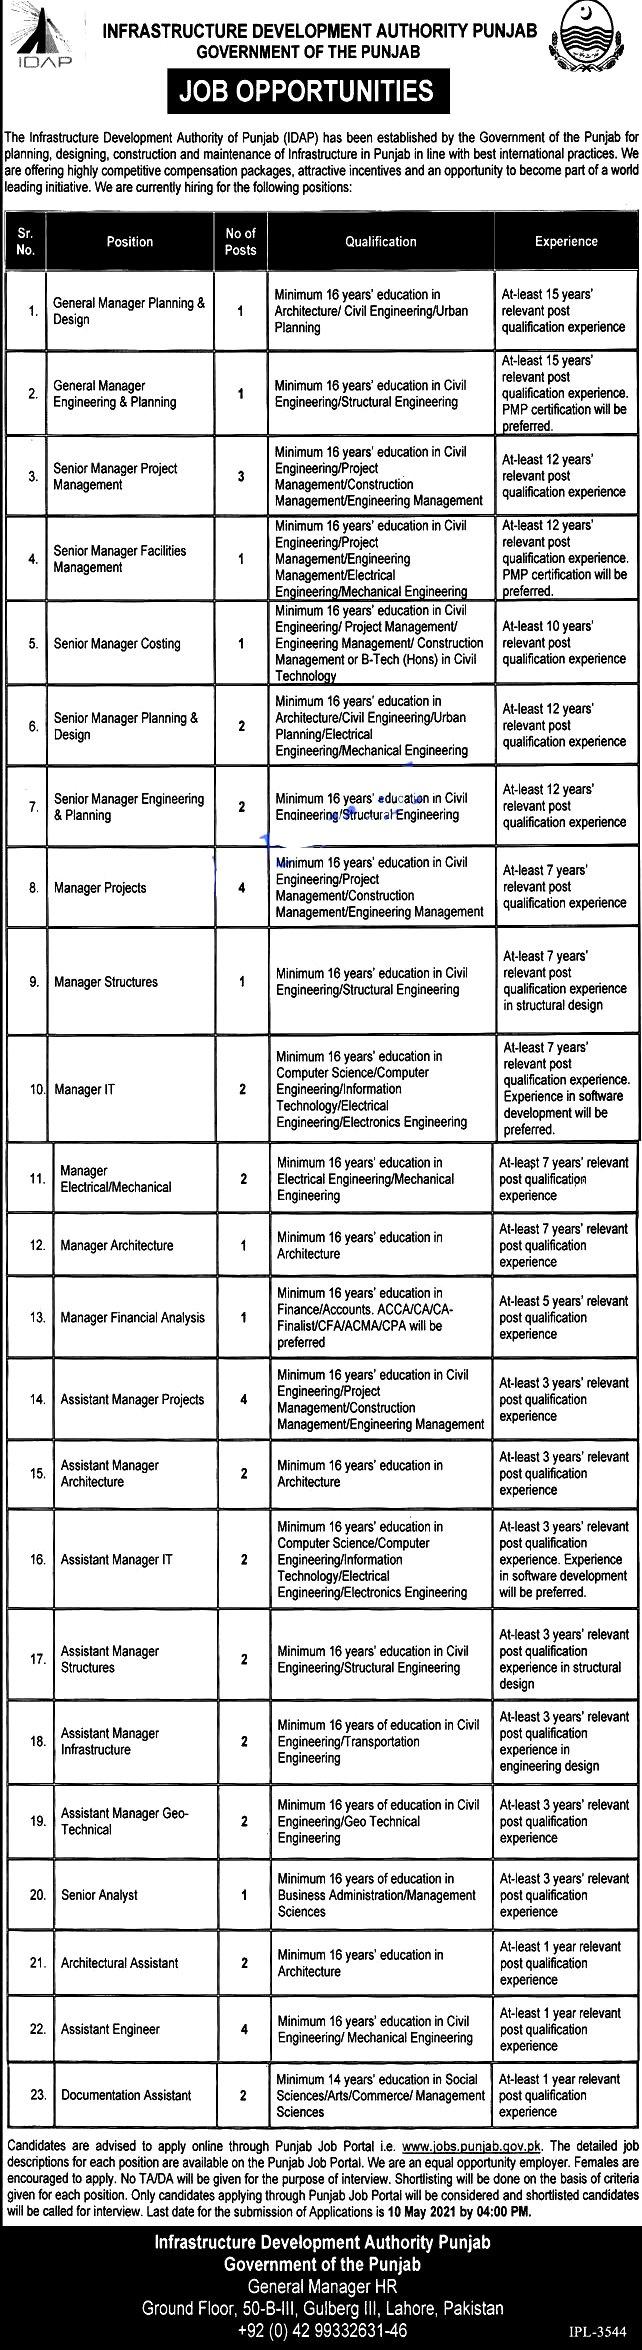 Infrastructure Development Authority of Punjab IDAP Latest Government Vacancies  April 2021